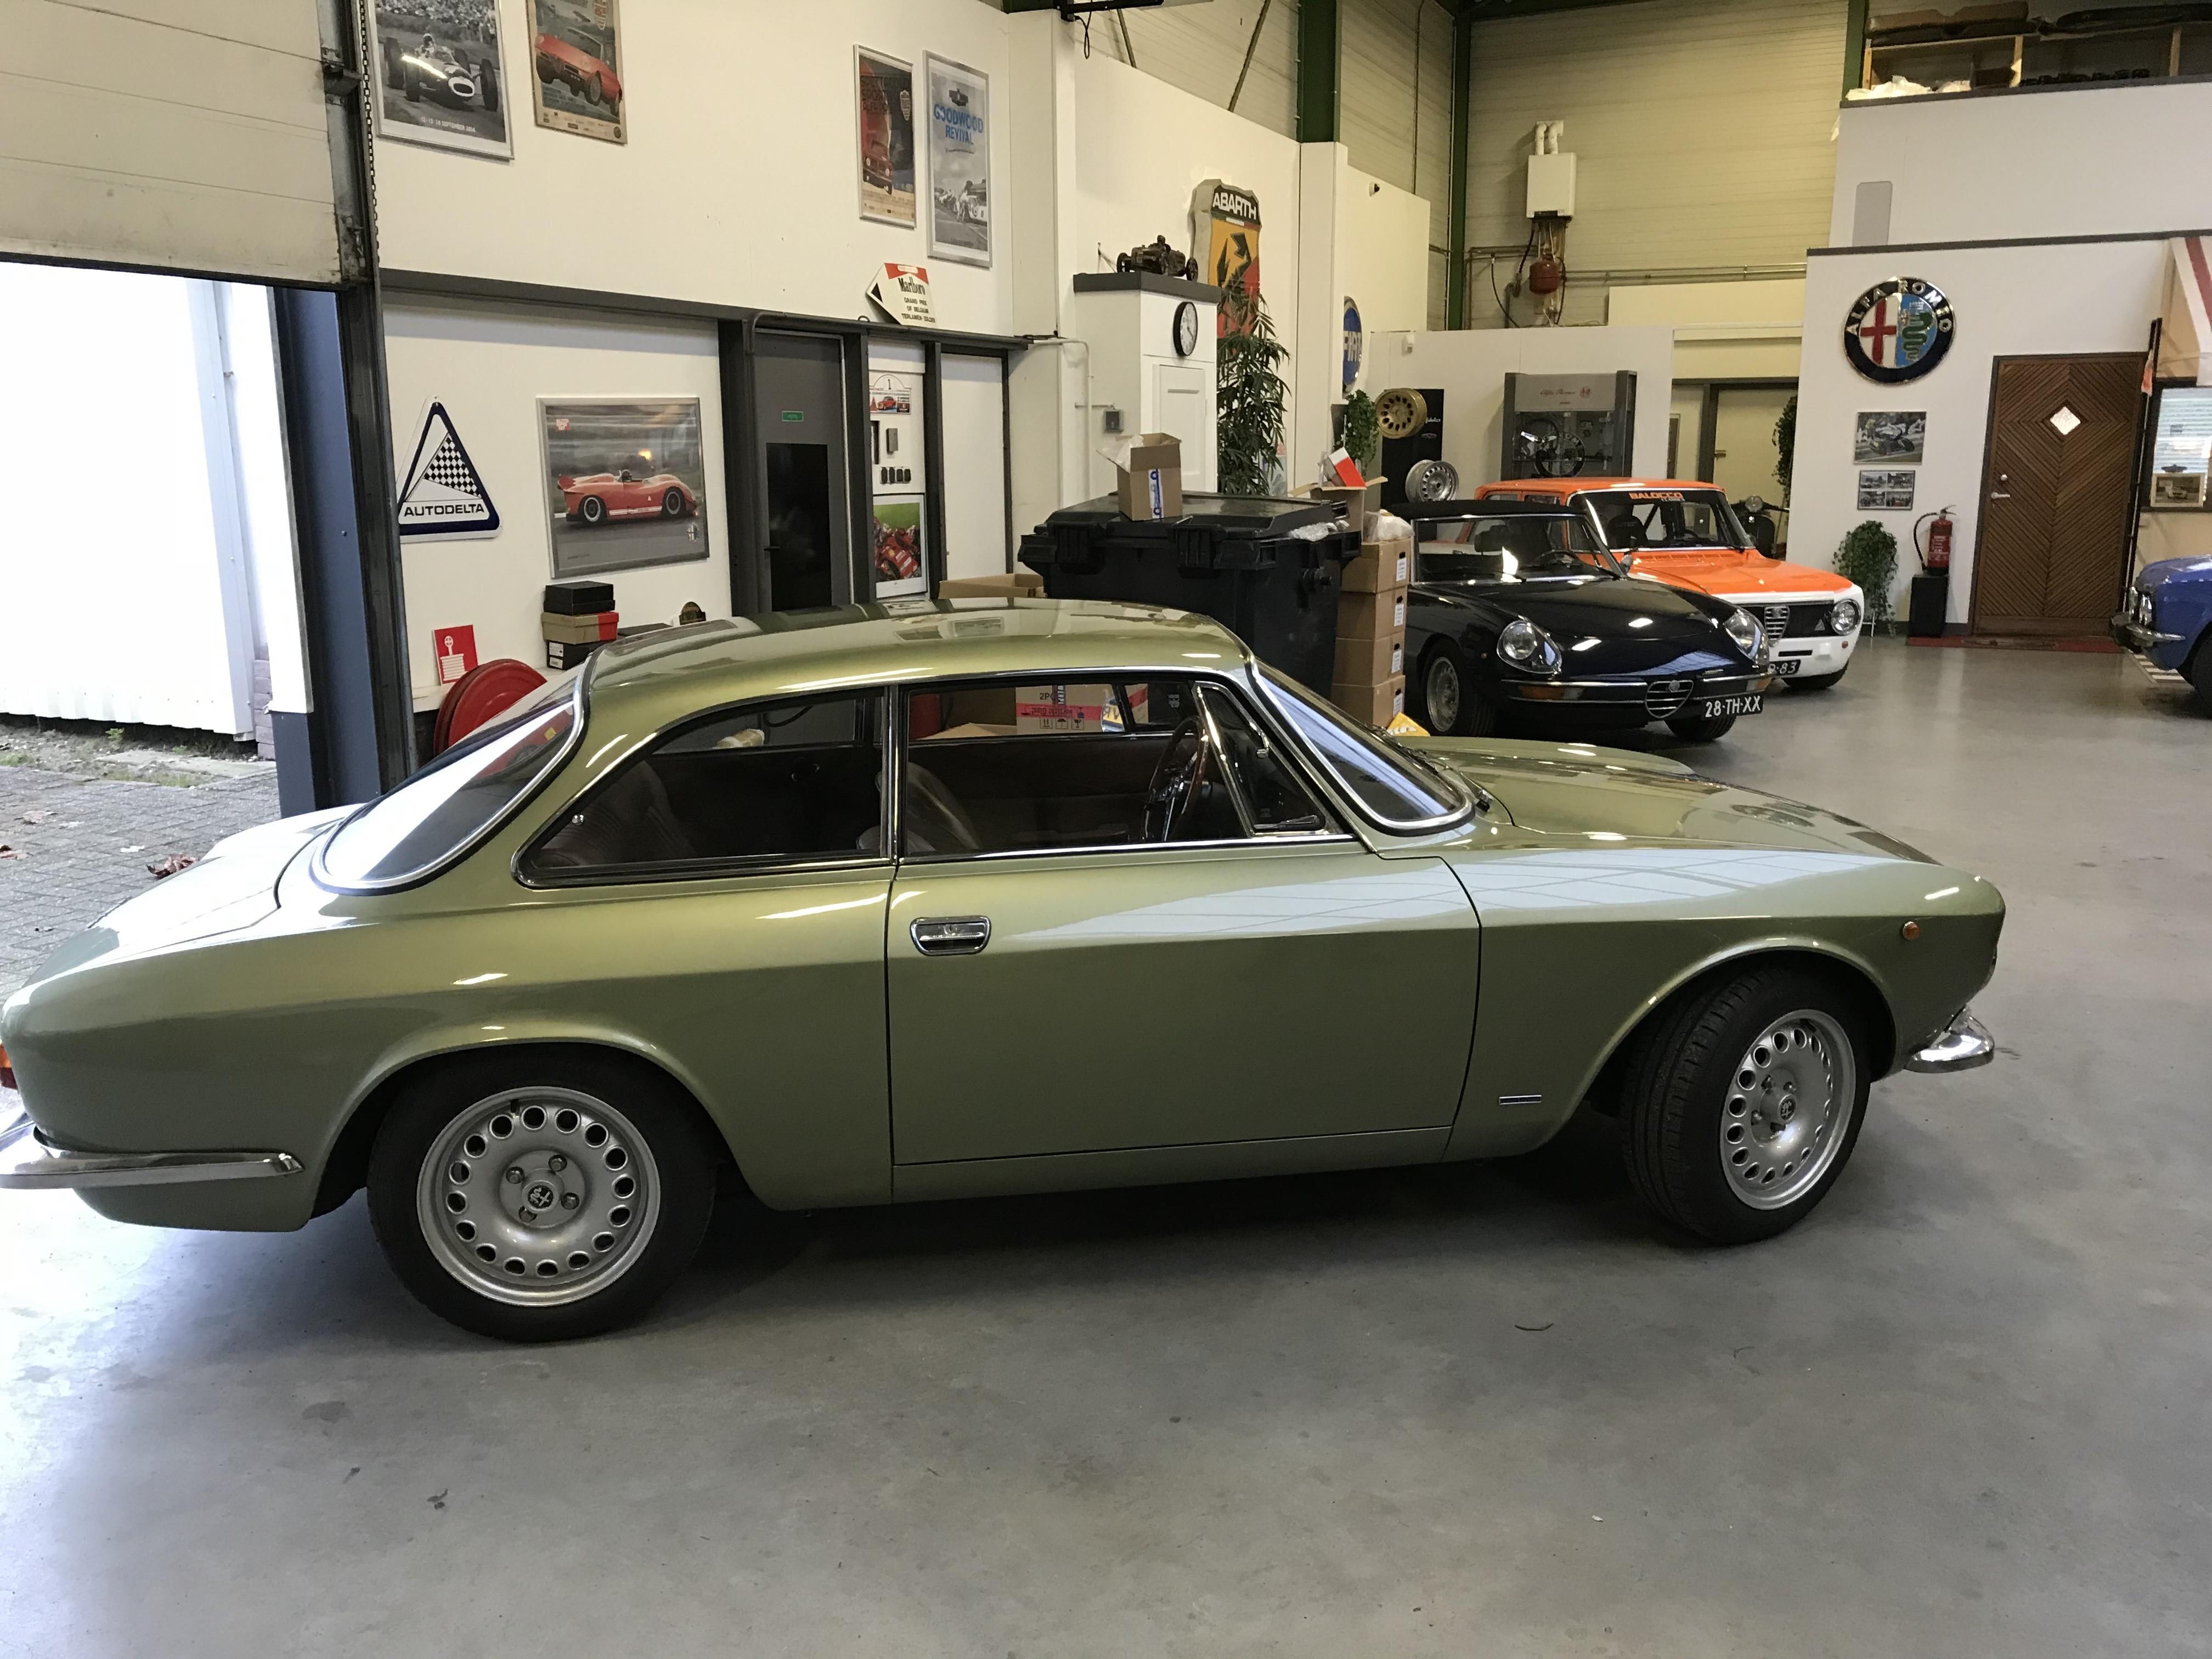 bertone GT 1300 Junior - 1973 - Vert Olive Uo7k0N